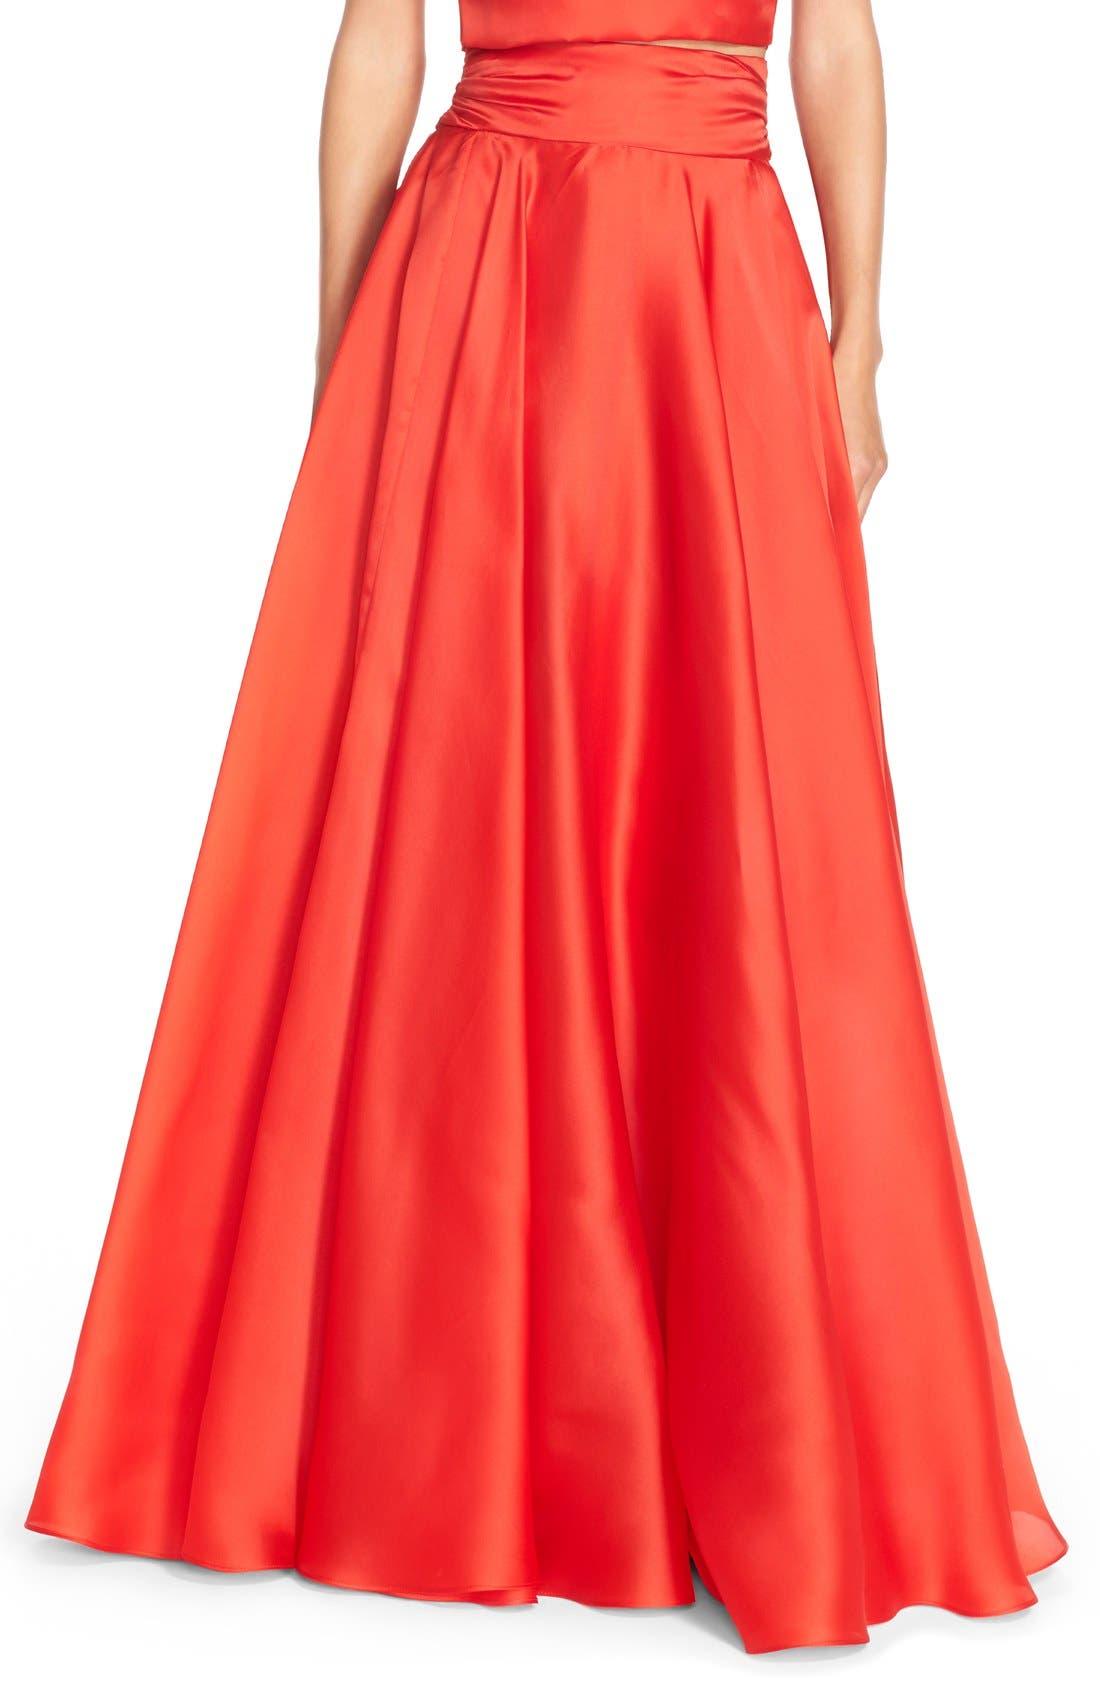 MILLY,                             Silk Satin Bow Back Ball Skirt,                             Main thumbnail 1, color,                             650